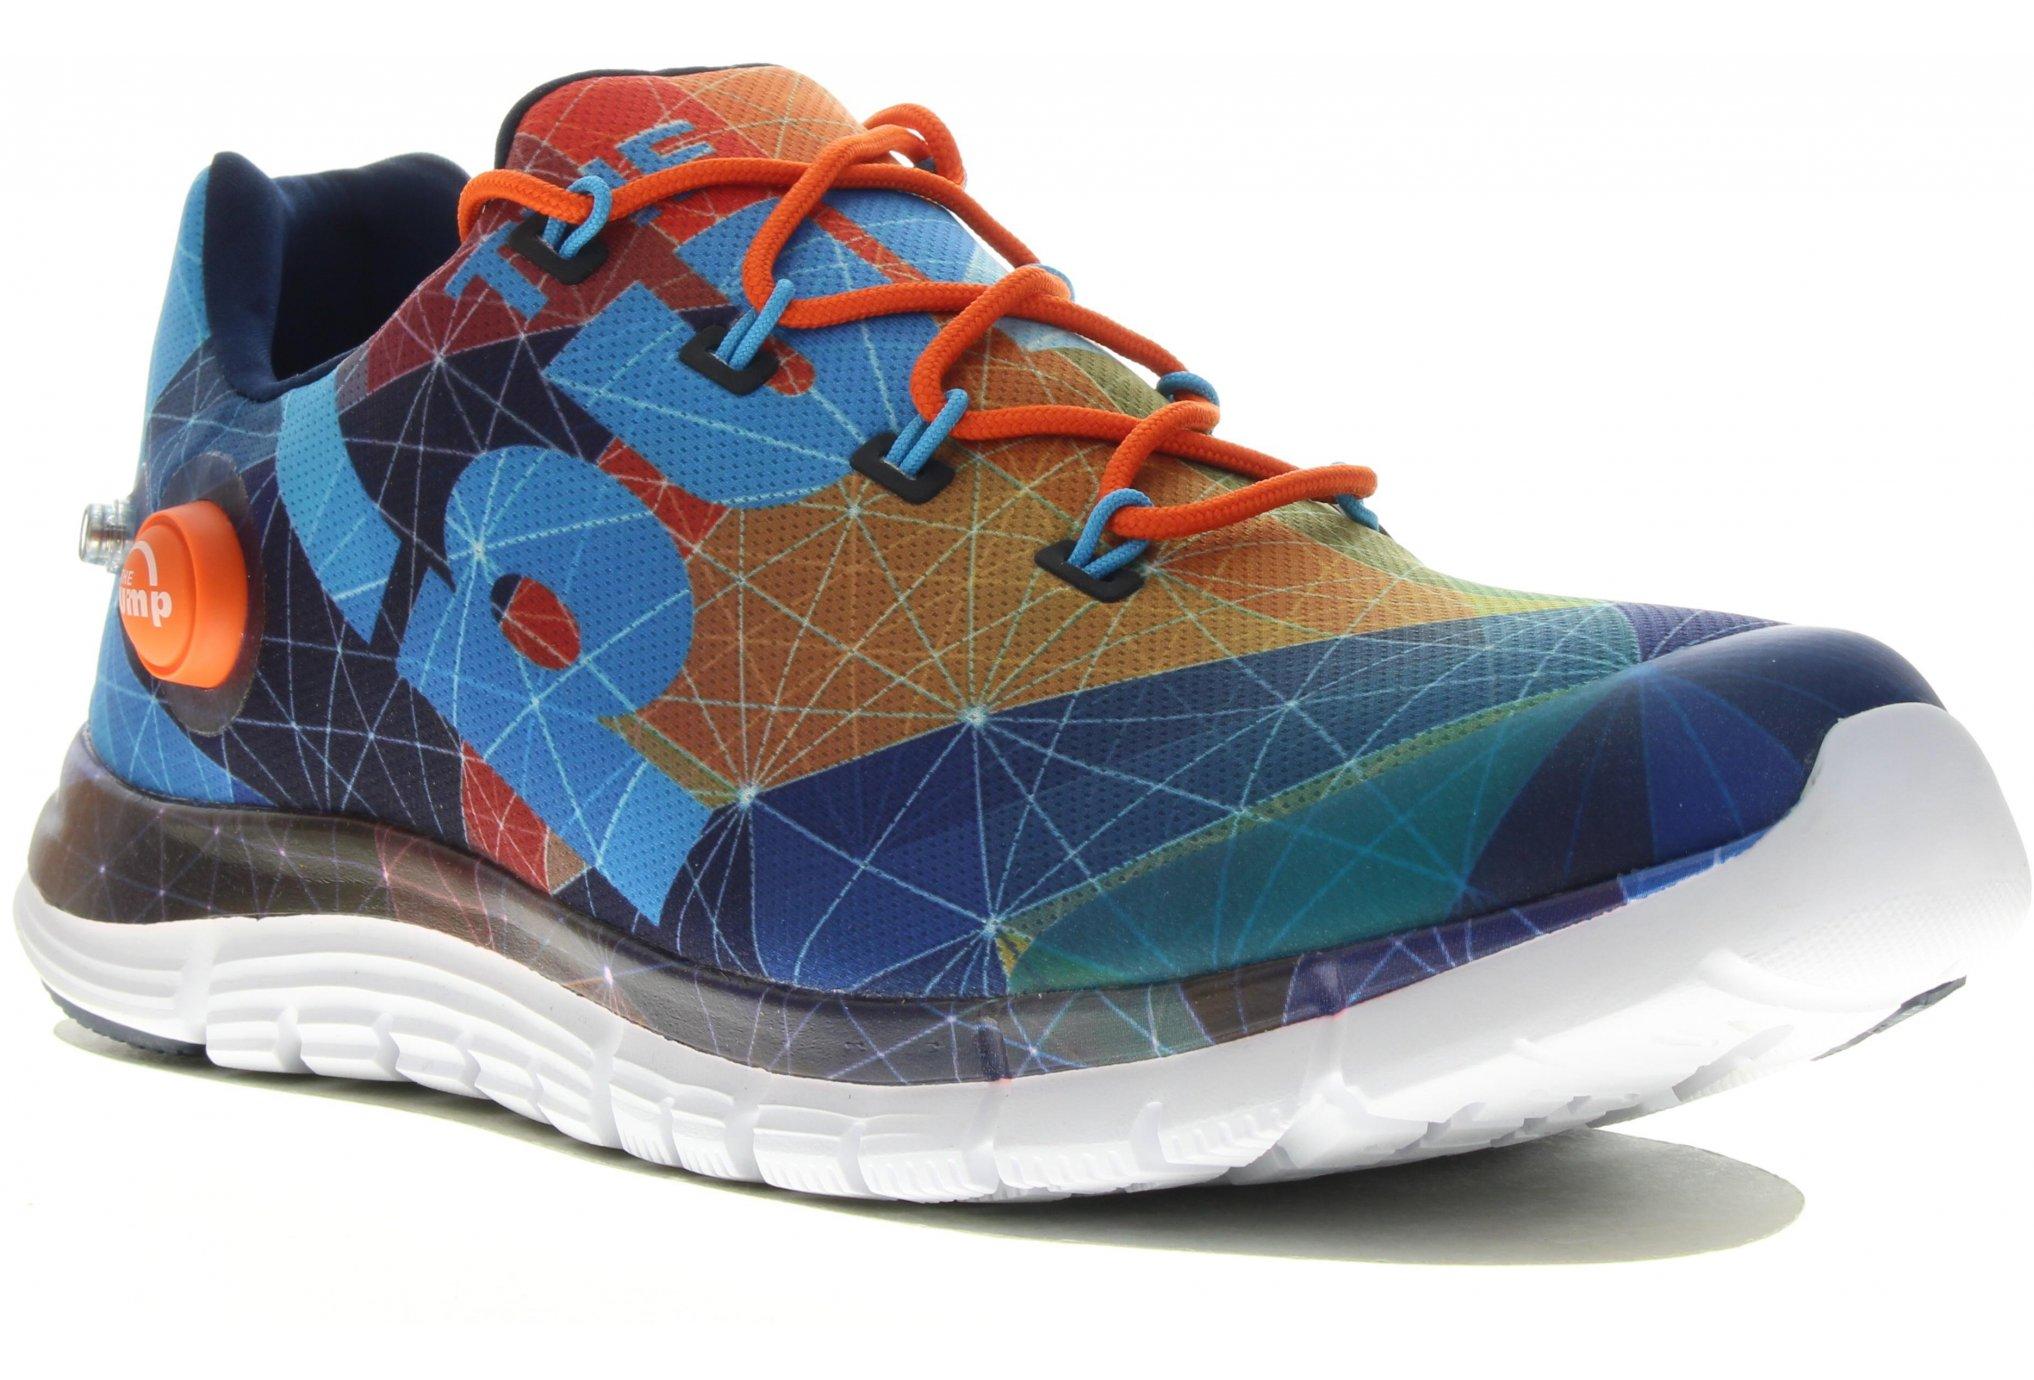 a125eb49711761 UAG running - Reebok ZPump Fusion AG M Di tique Chaussures homme ...